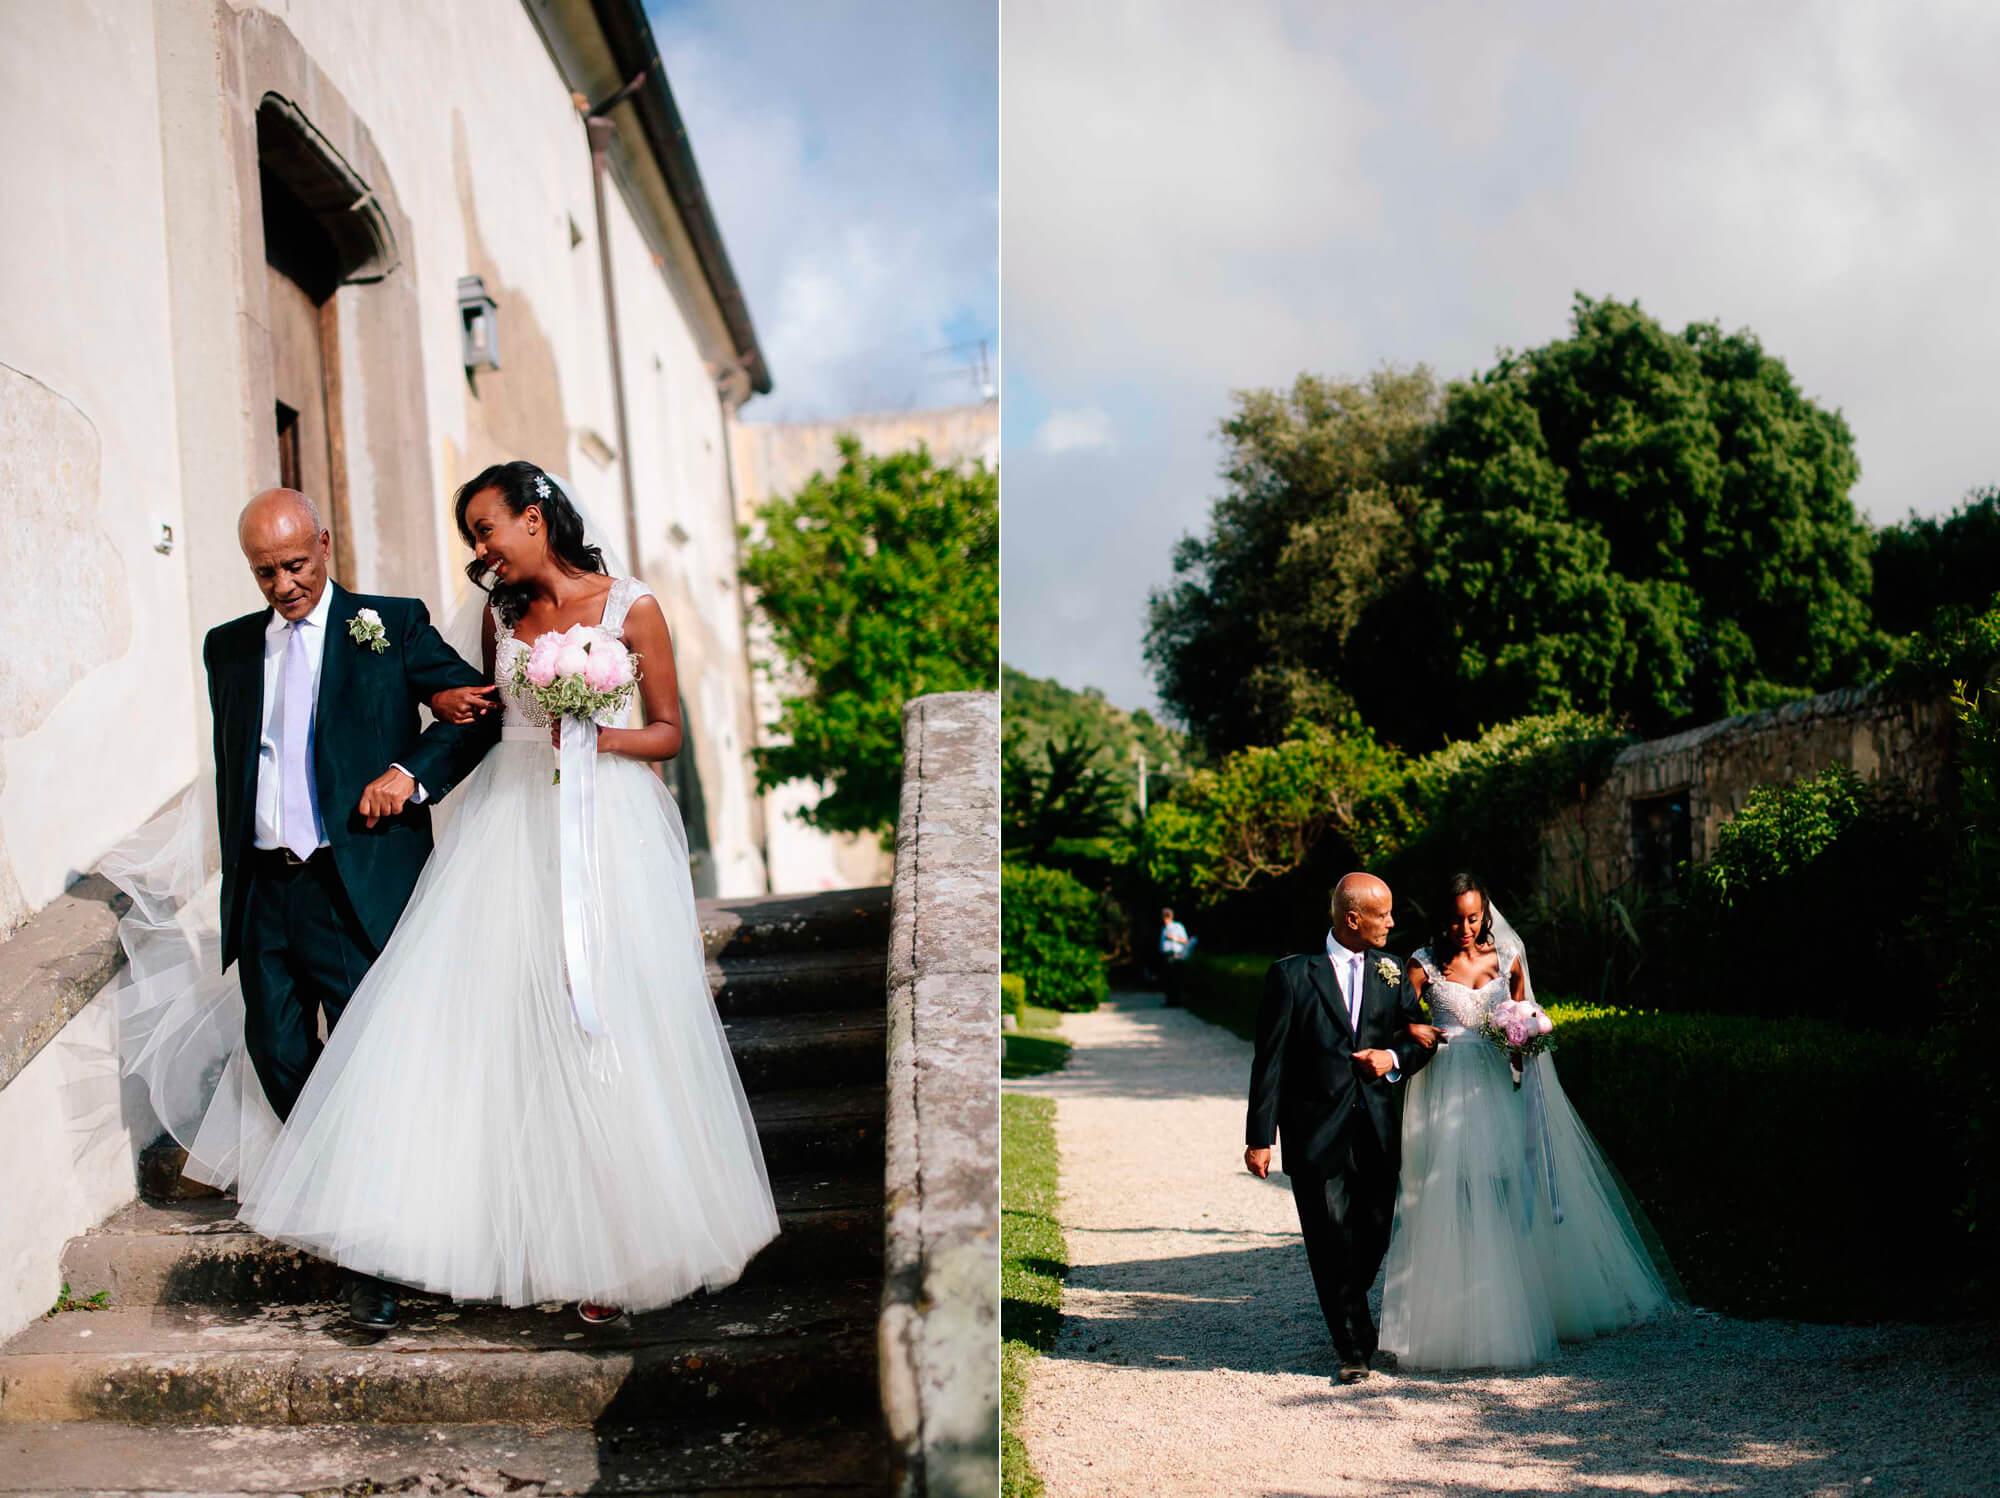 055-sorrento-wedding-photographer.jpg